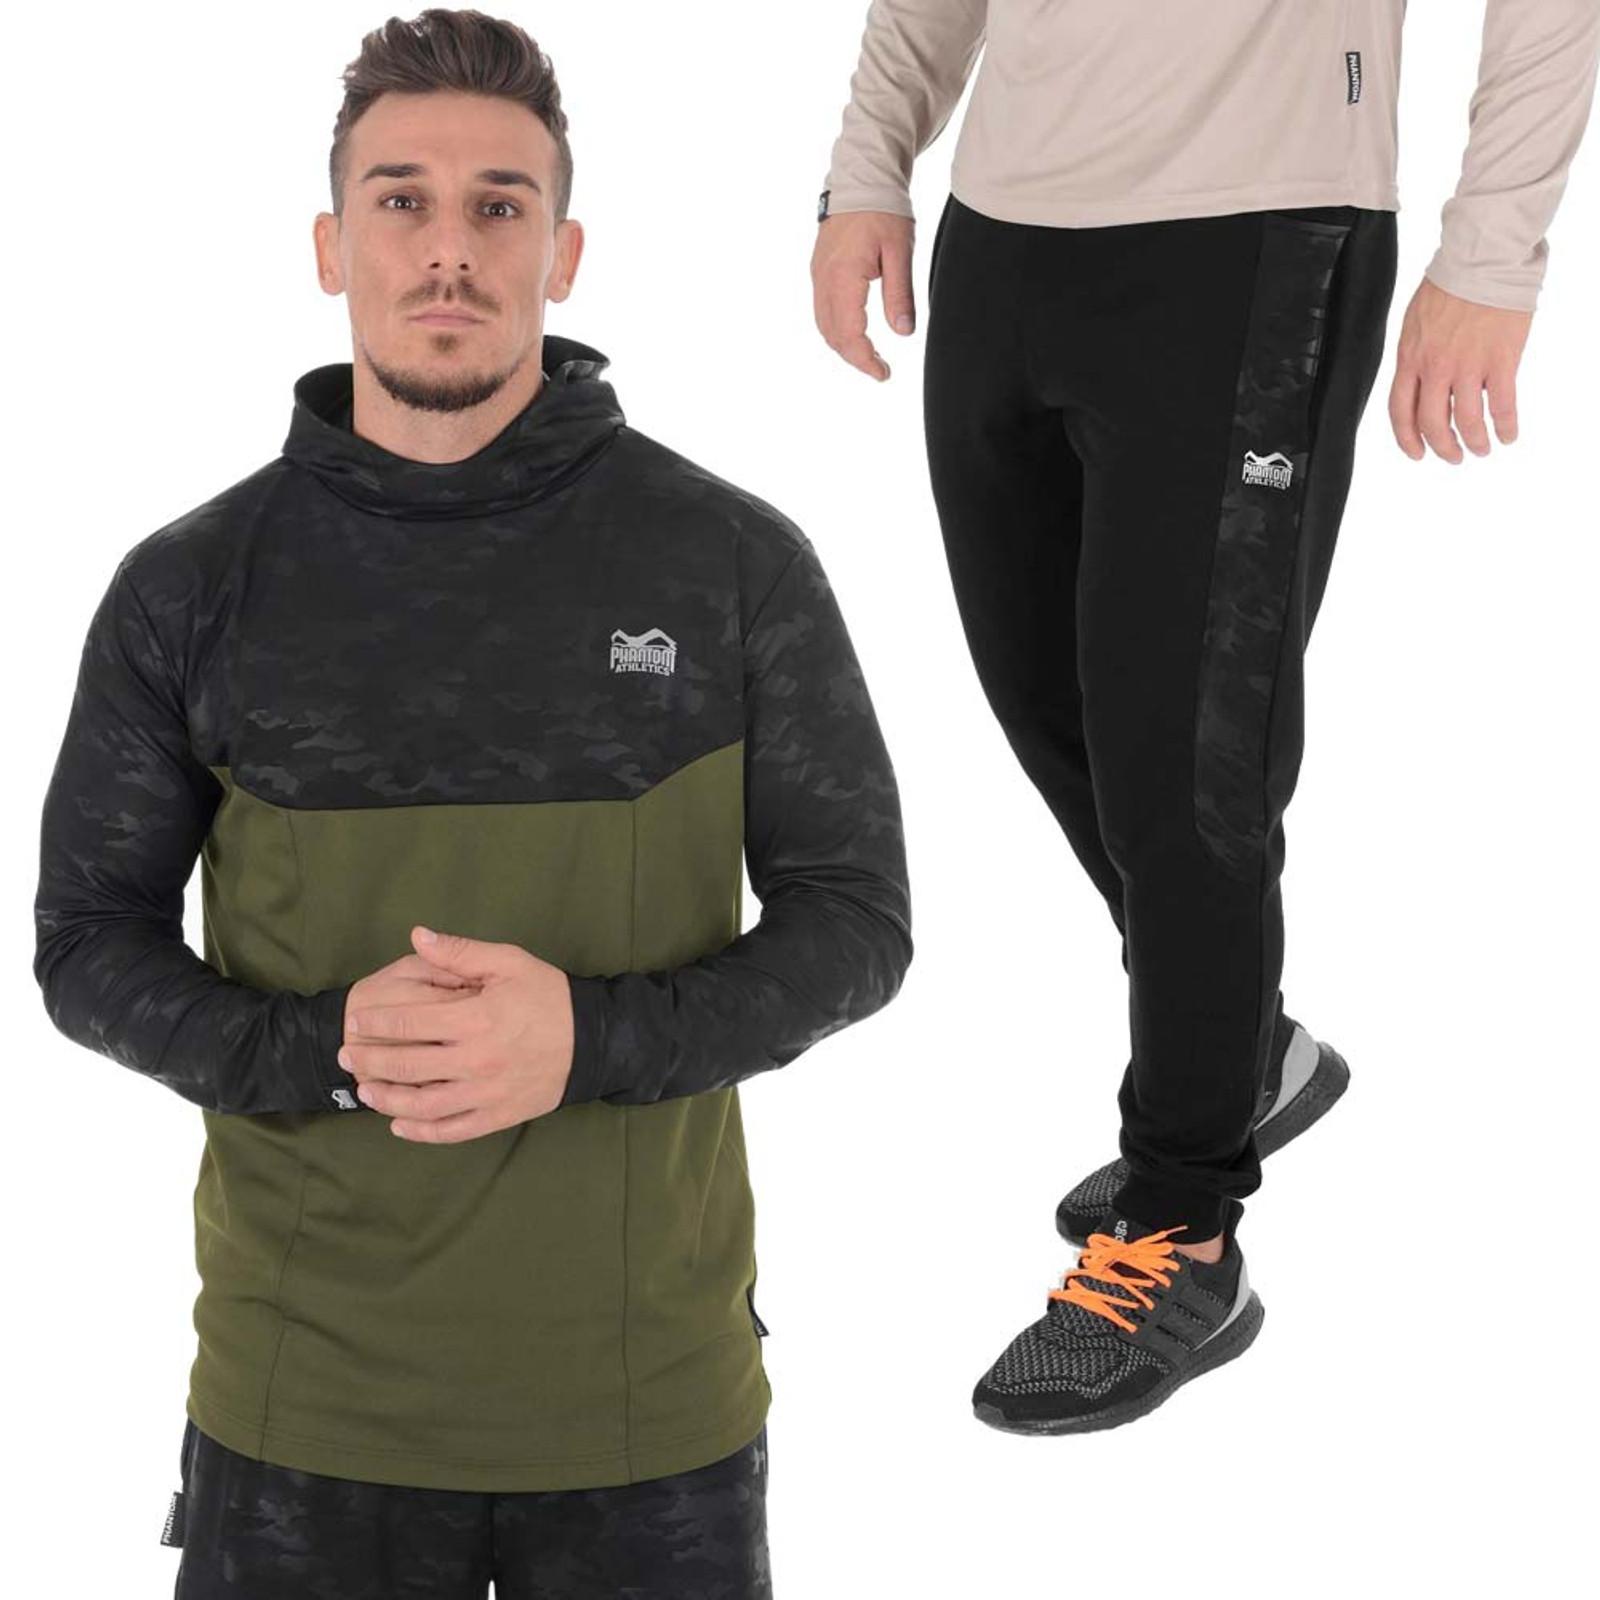 [Paket] Phantom Athletics Herren Outfit Bundle Shadow: Hoodie & Joggingshose